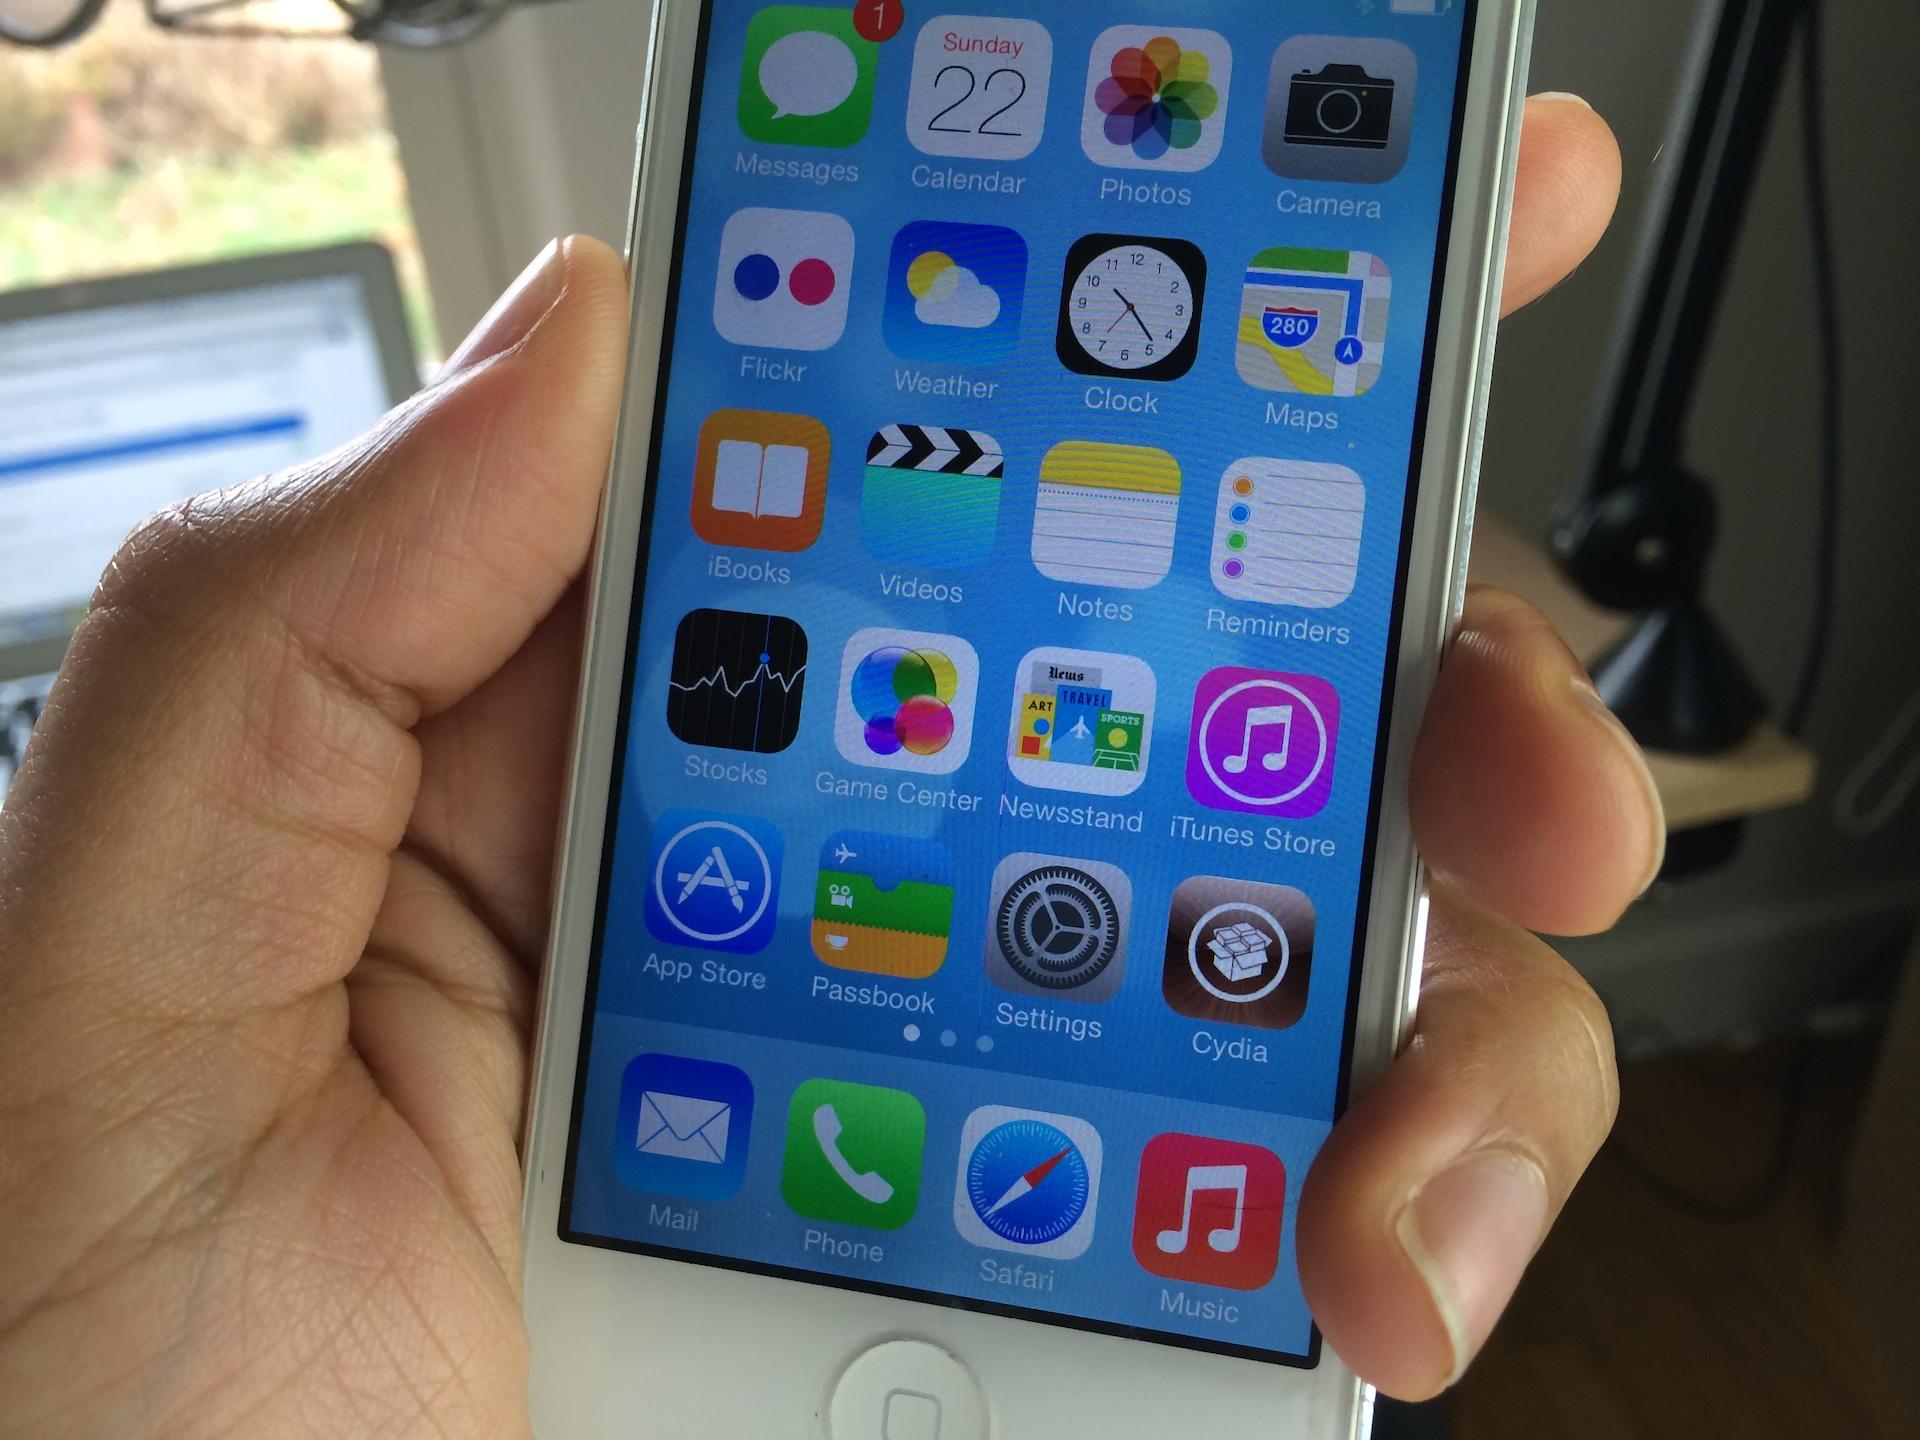 iPhone iOS 7 Jailbreak